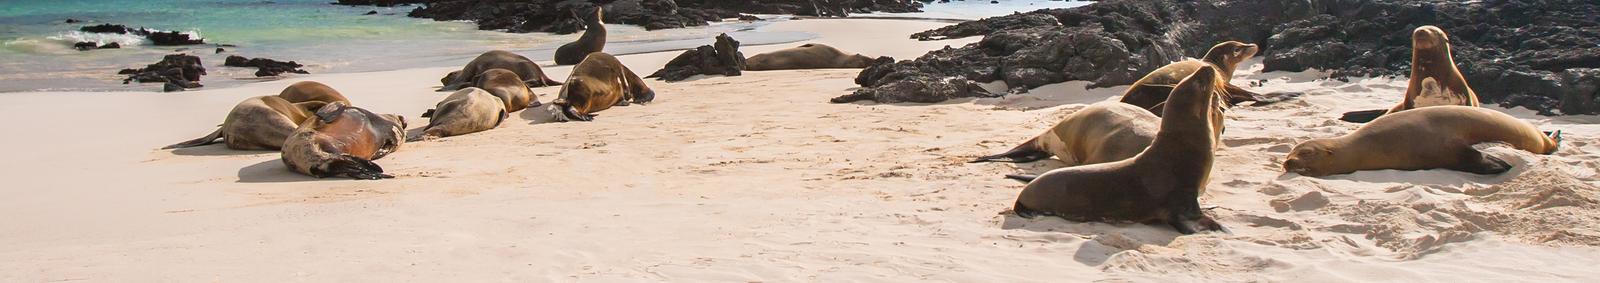 Sea Lions on Galapagos beach